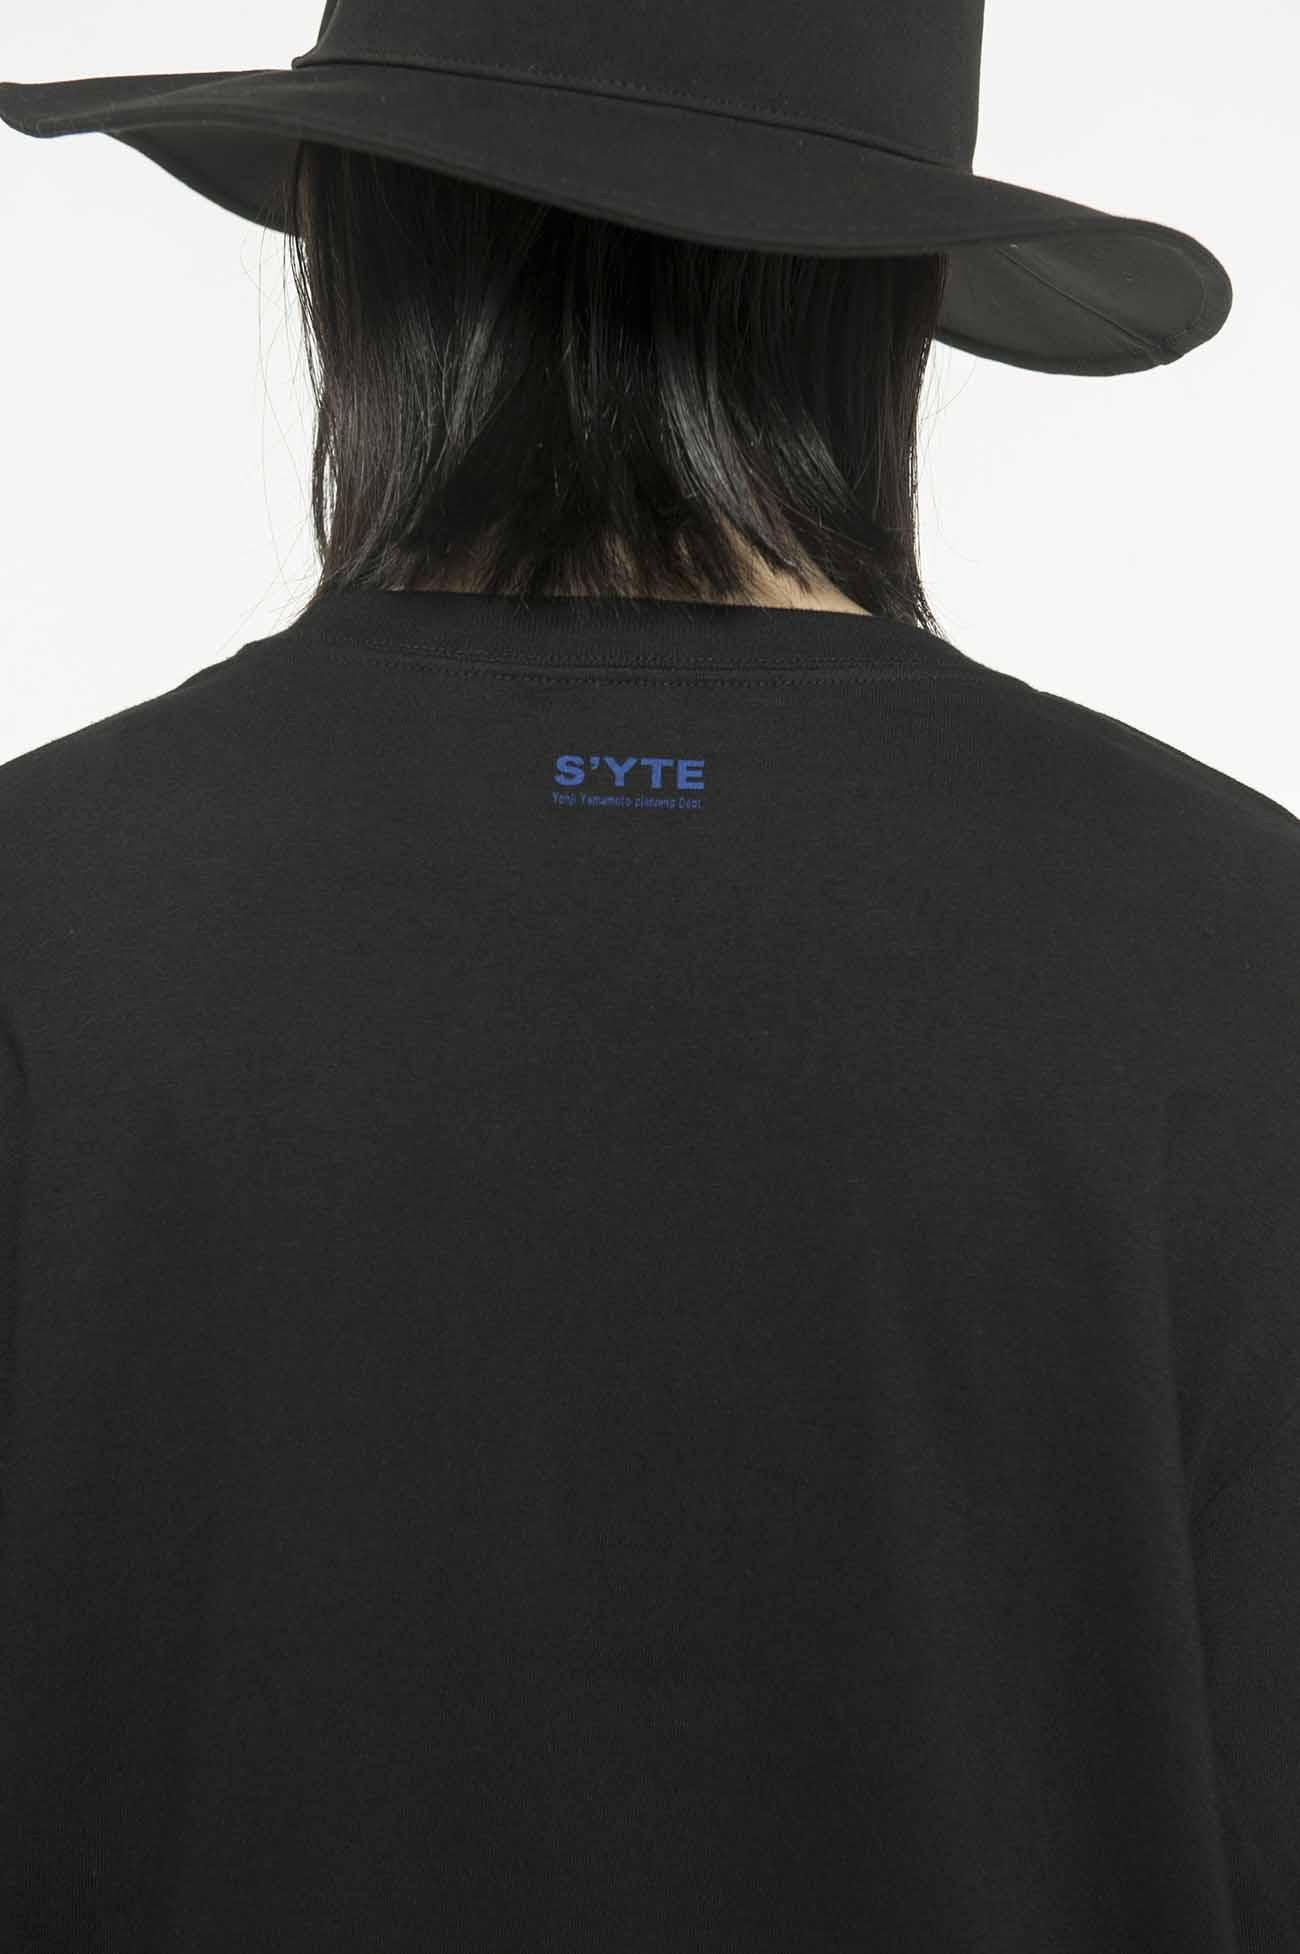 Serenade Gypsy Swing T恤